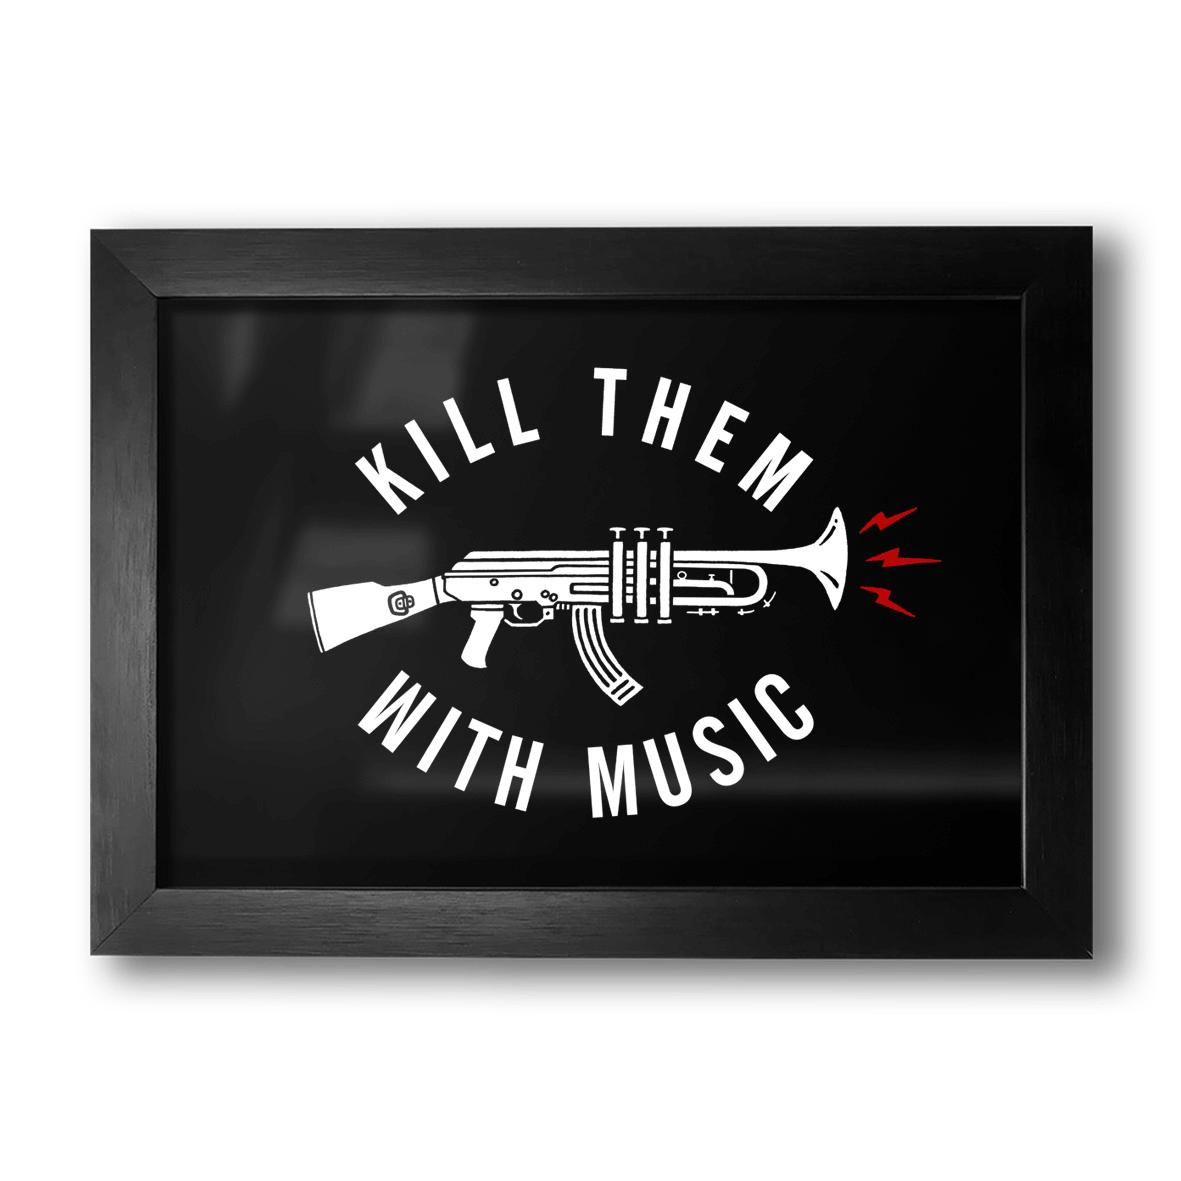 Quadro A4 - Kill Them With Music